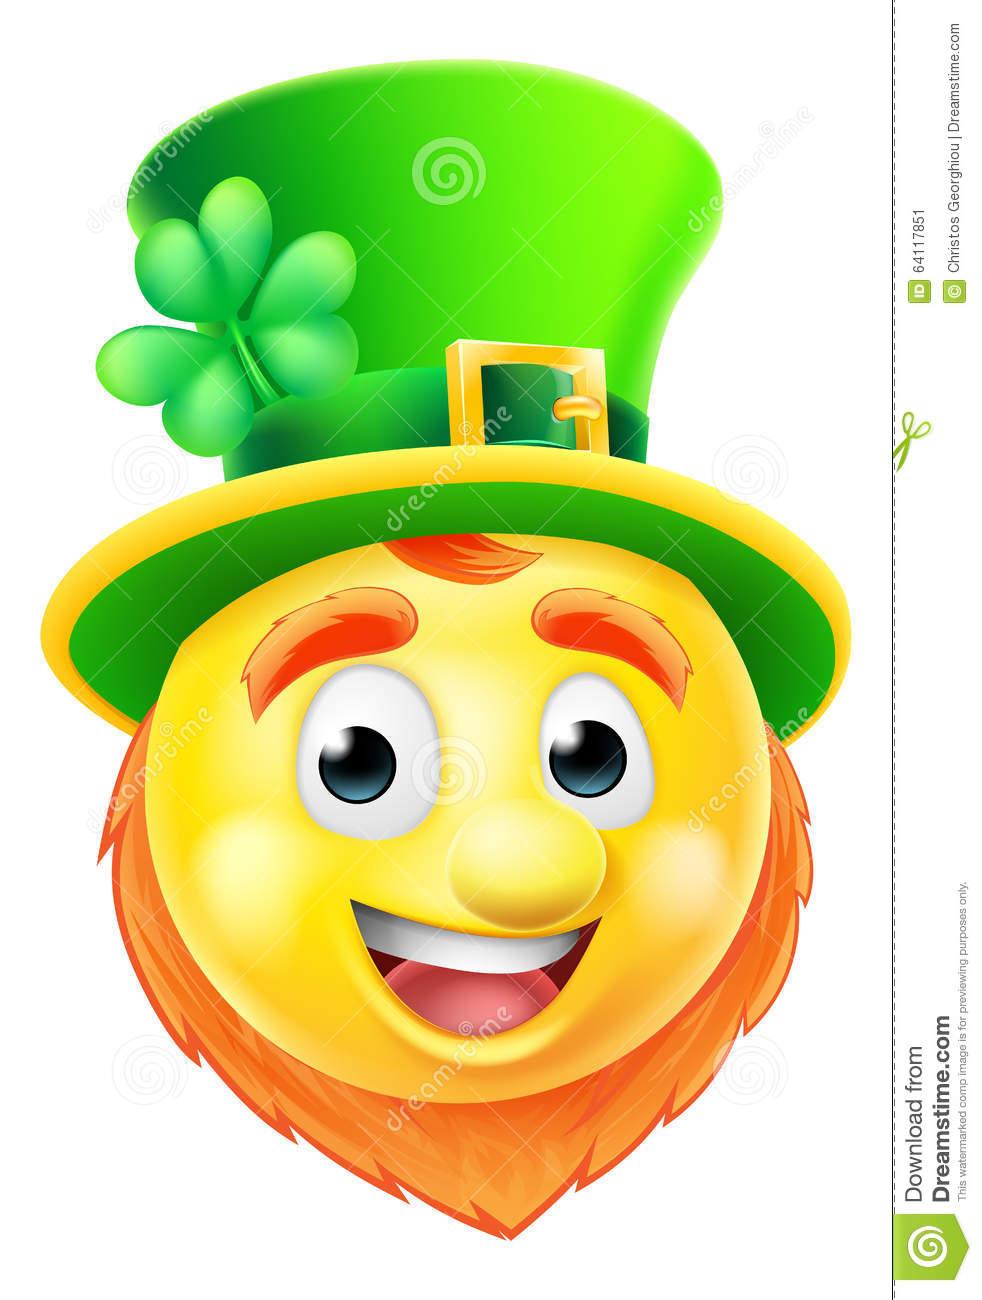 Cartoon St Patricks Day Leprechaun Emoji Emoticon Character